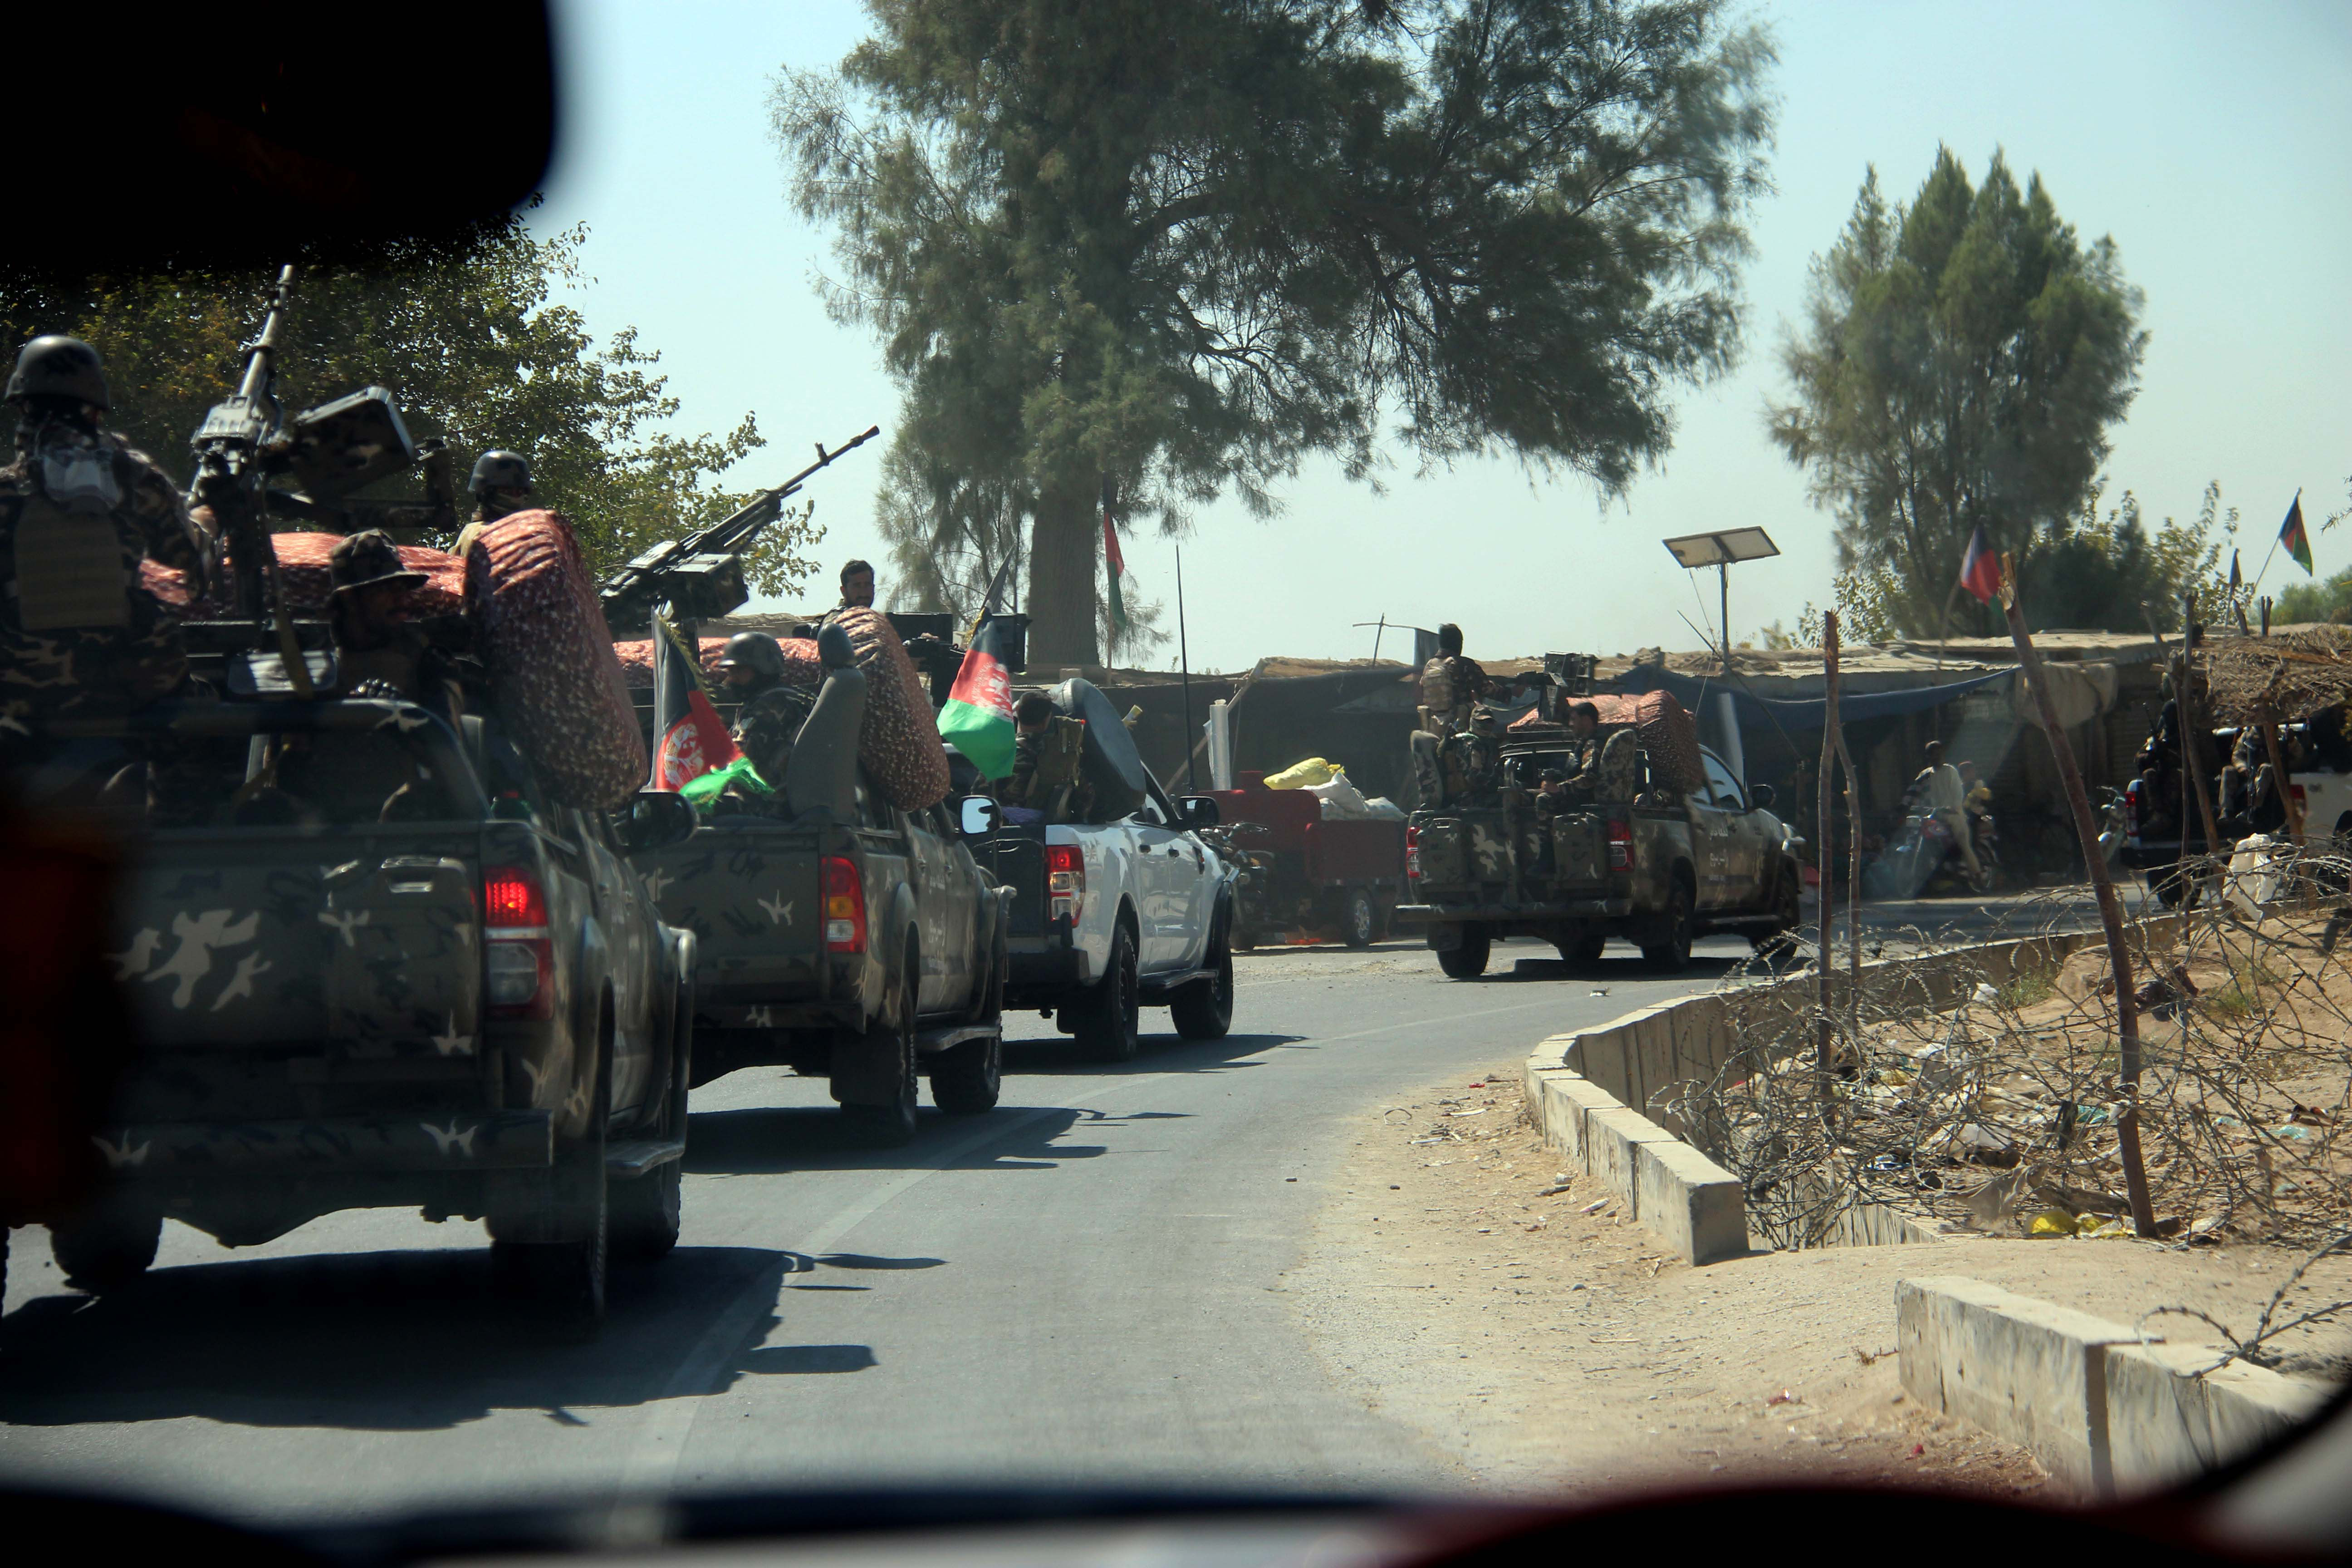 Afghan Airstrike Targeting Taliban Kills 12 Children as Peace Talks Stall